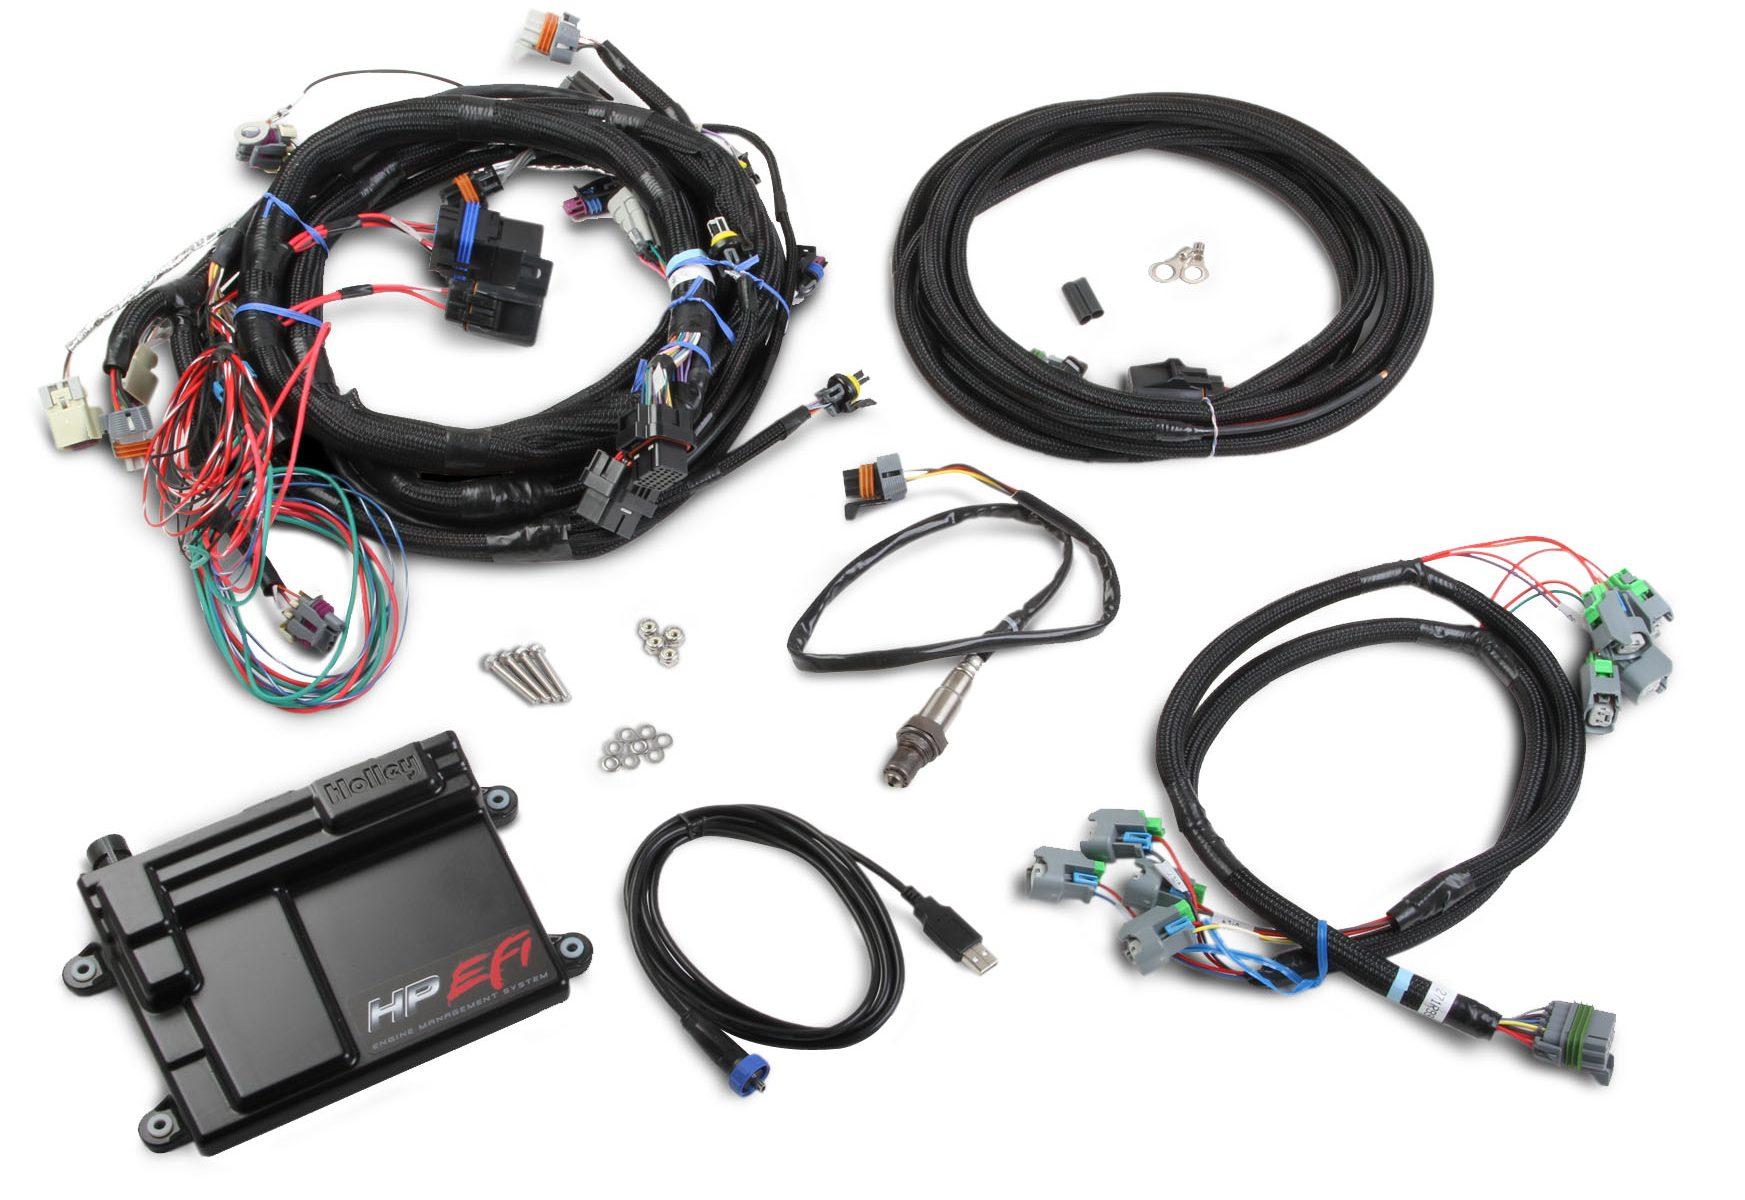 medium resolution of home shop wiring harness holley gm ls2 ls3 ls7 hp efi ecu harness kits